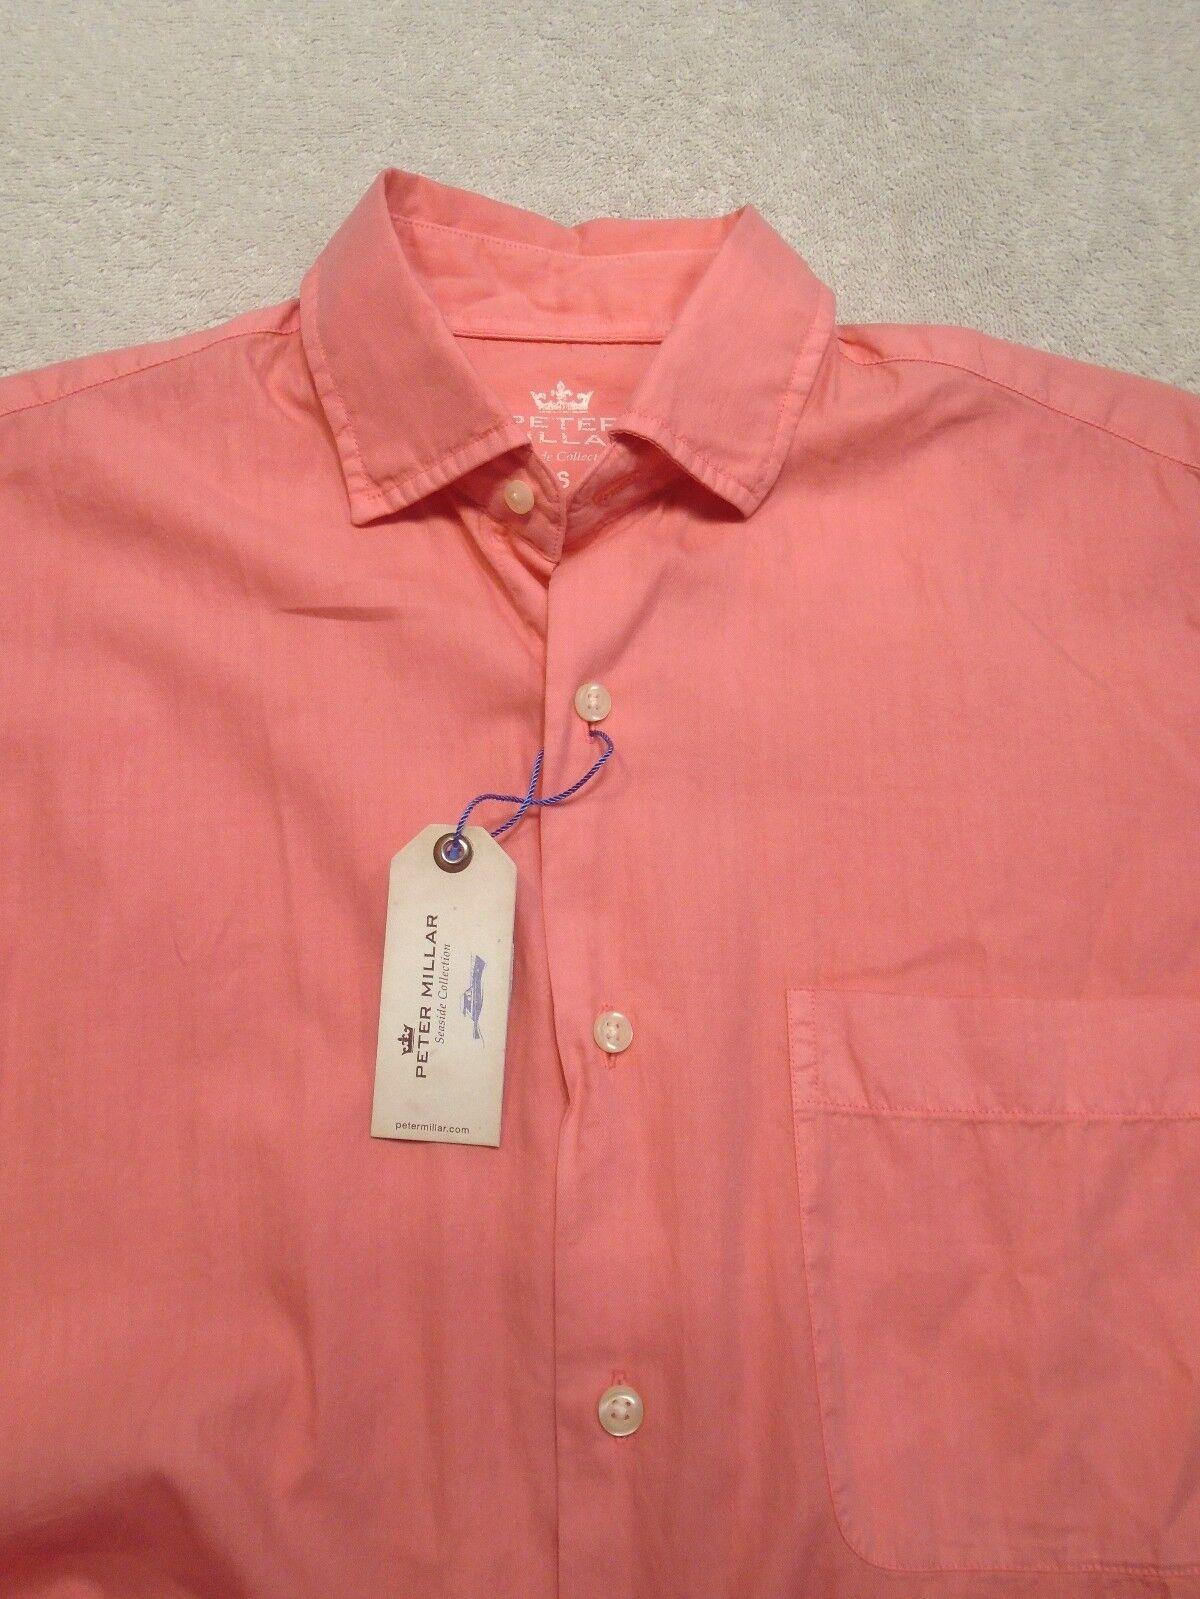 Peter Millar Cotton & Silk Short Sleeve Coral Pink Sport Shirt NWT Small